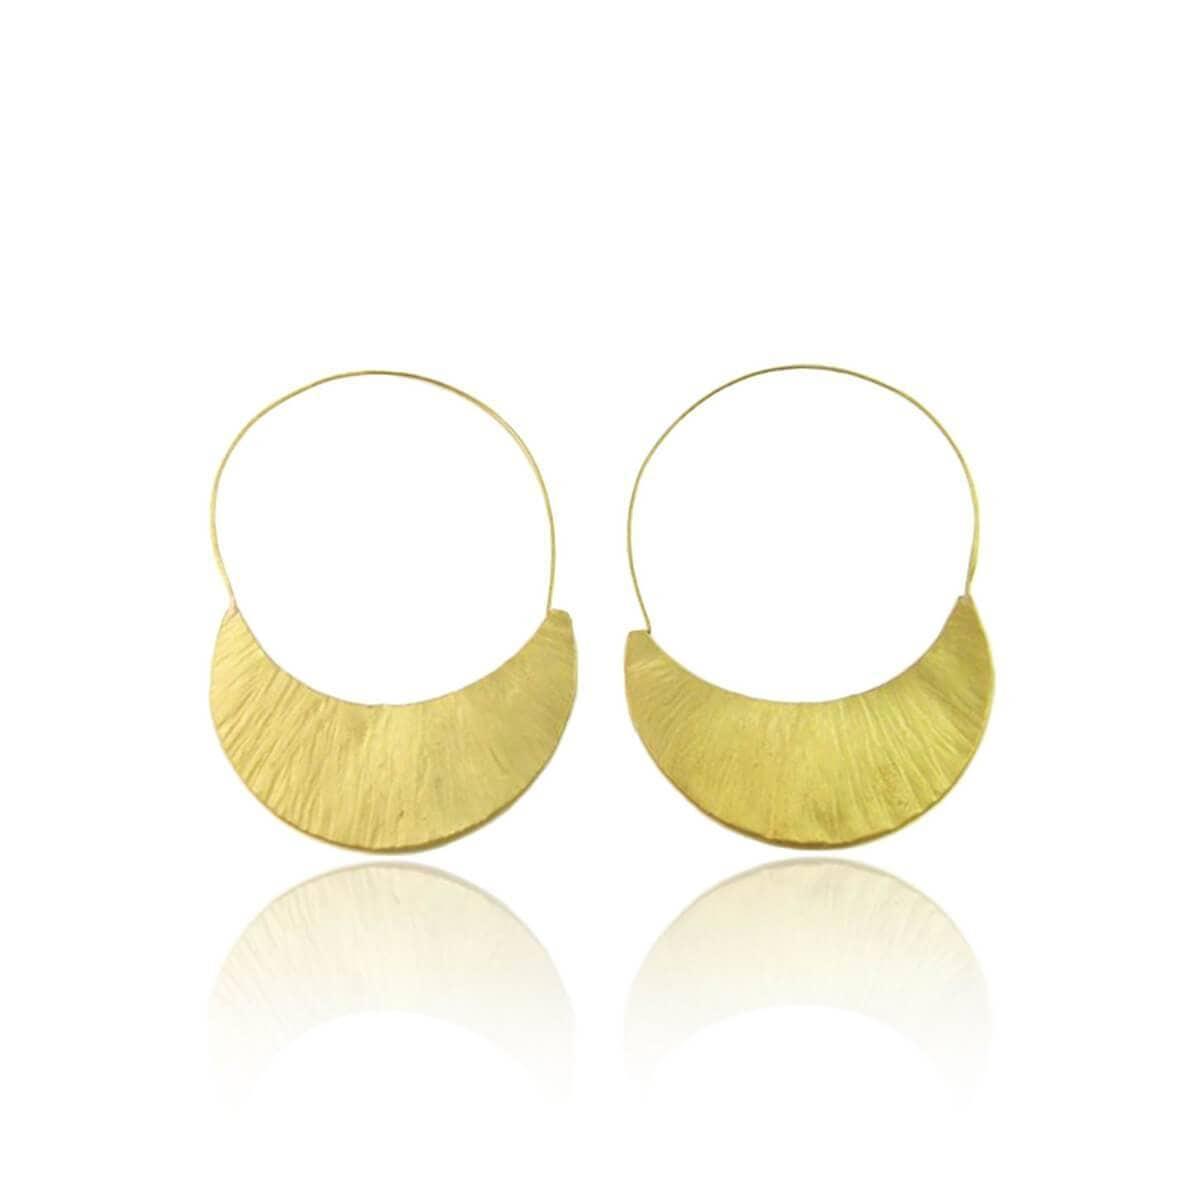 Plated Sterling Silver Moon Earrings